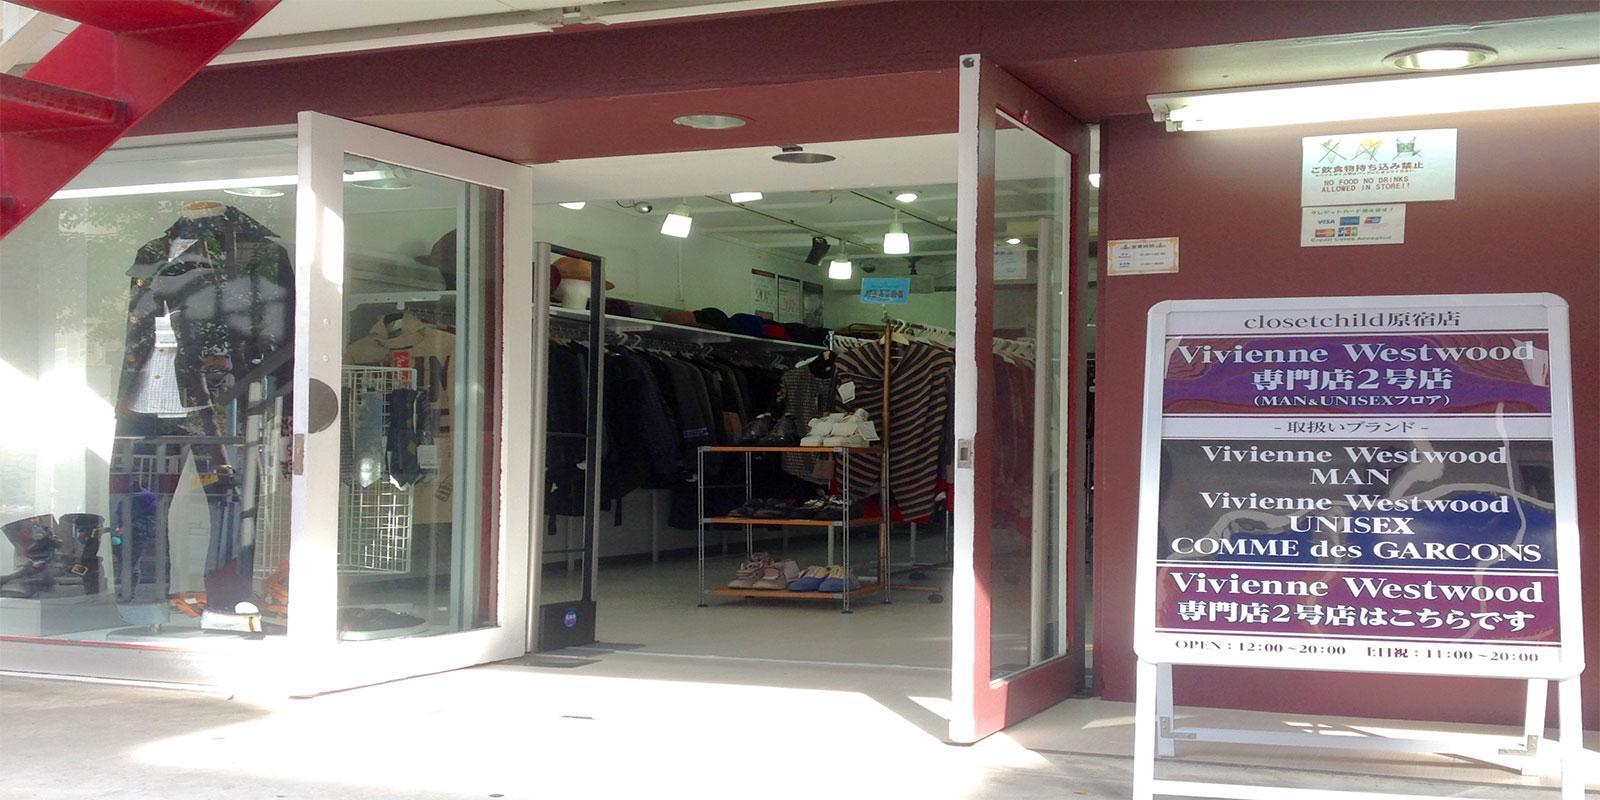 closetchild店